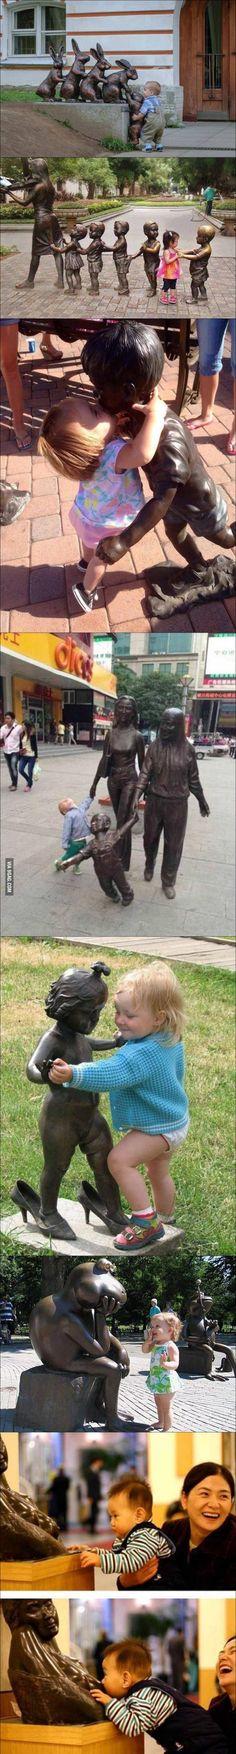 Charming Innocence! - www.viralpx.com